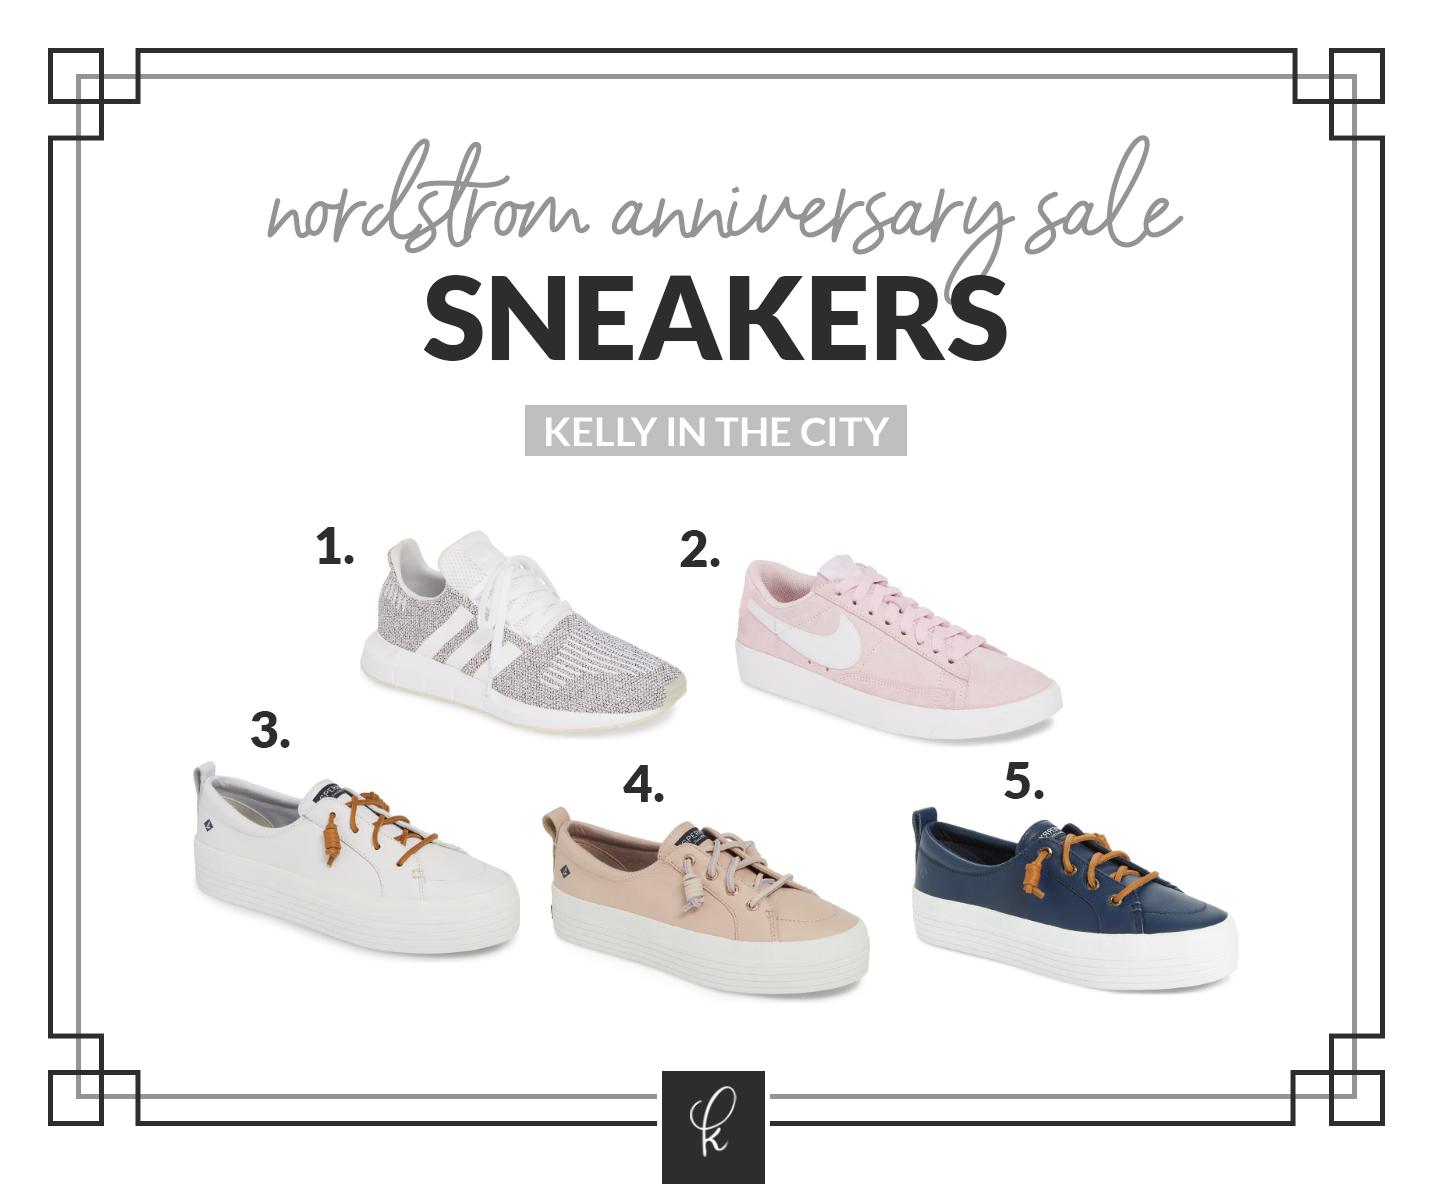 sneakers NSale